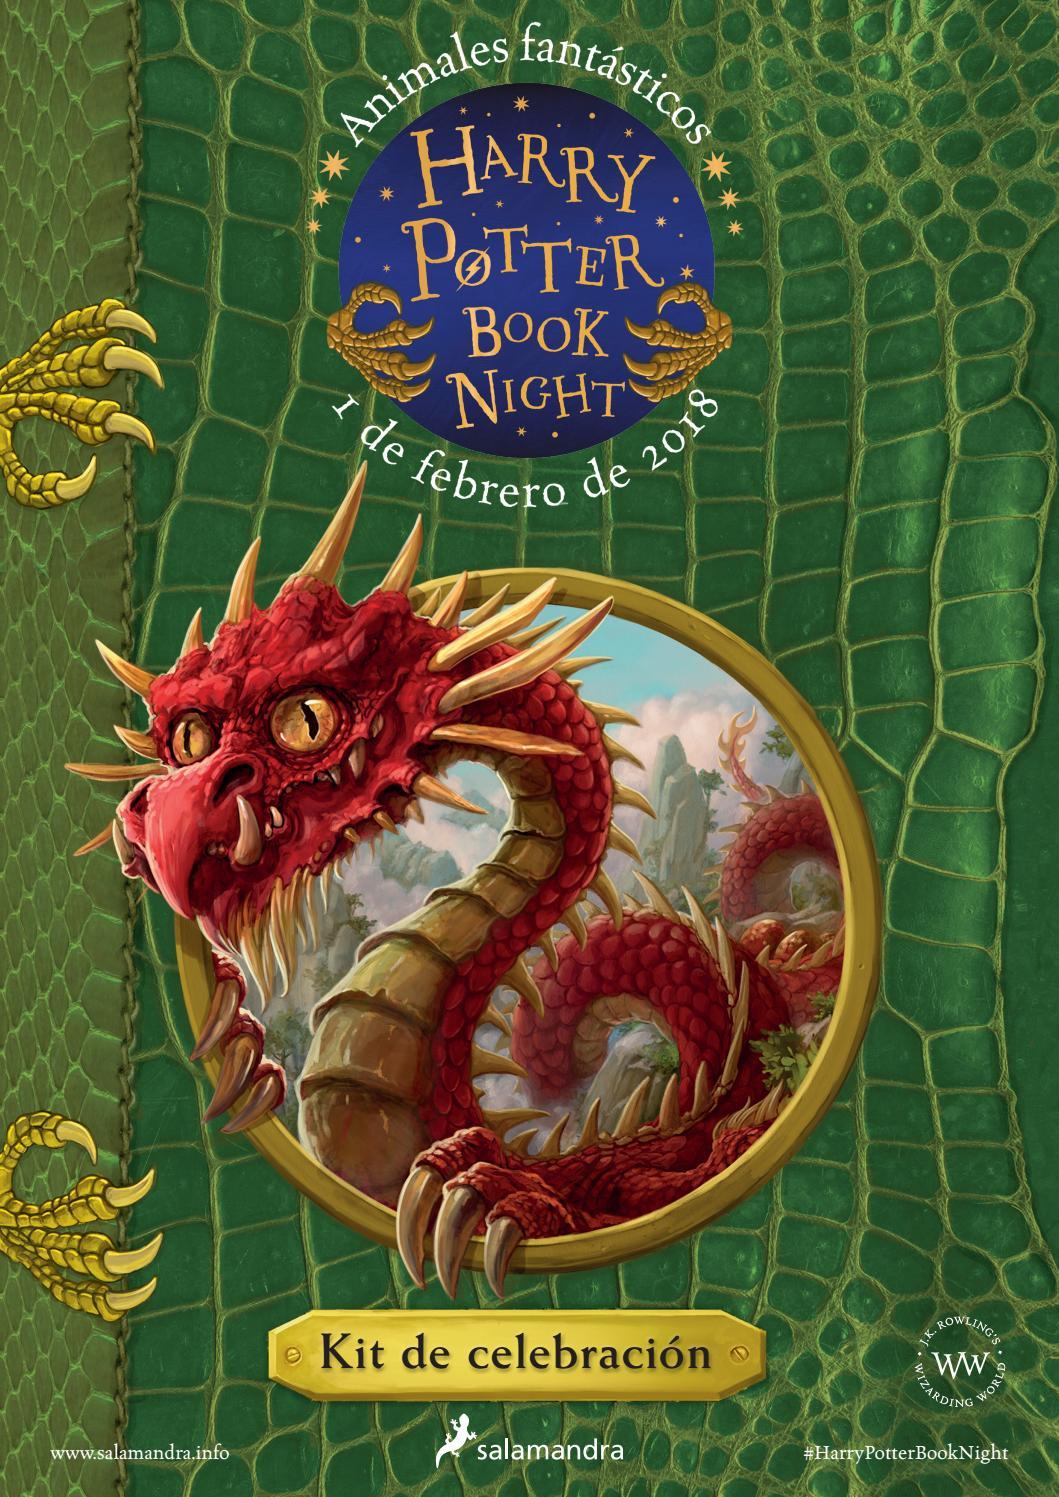 Harry Potter Book Night 2018 By Ediciones Salamandra Issuu